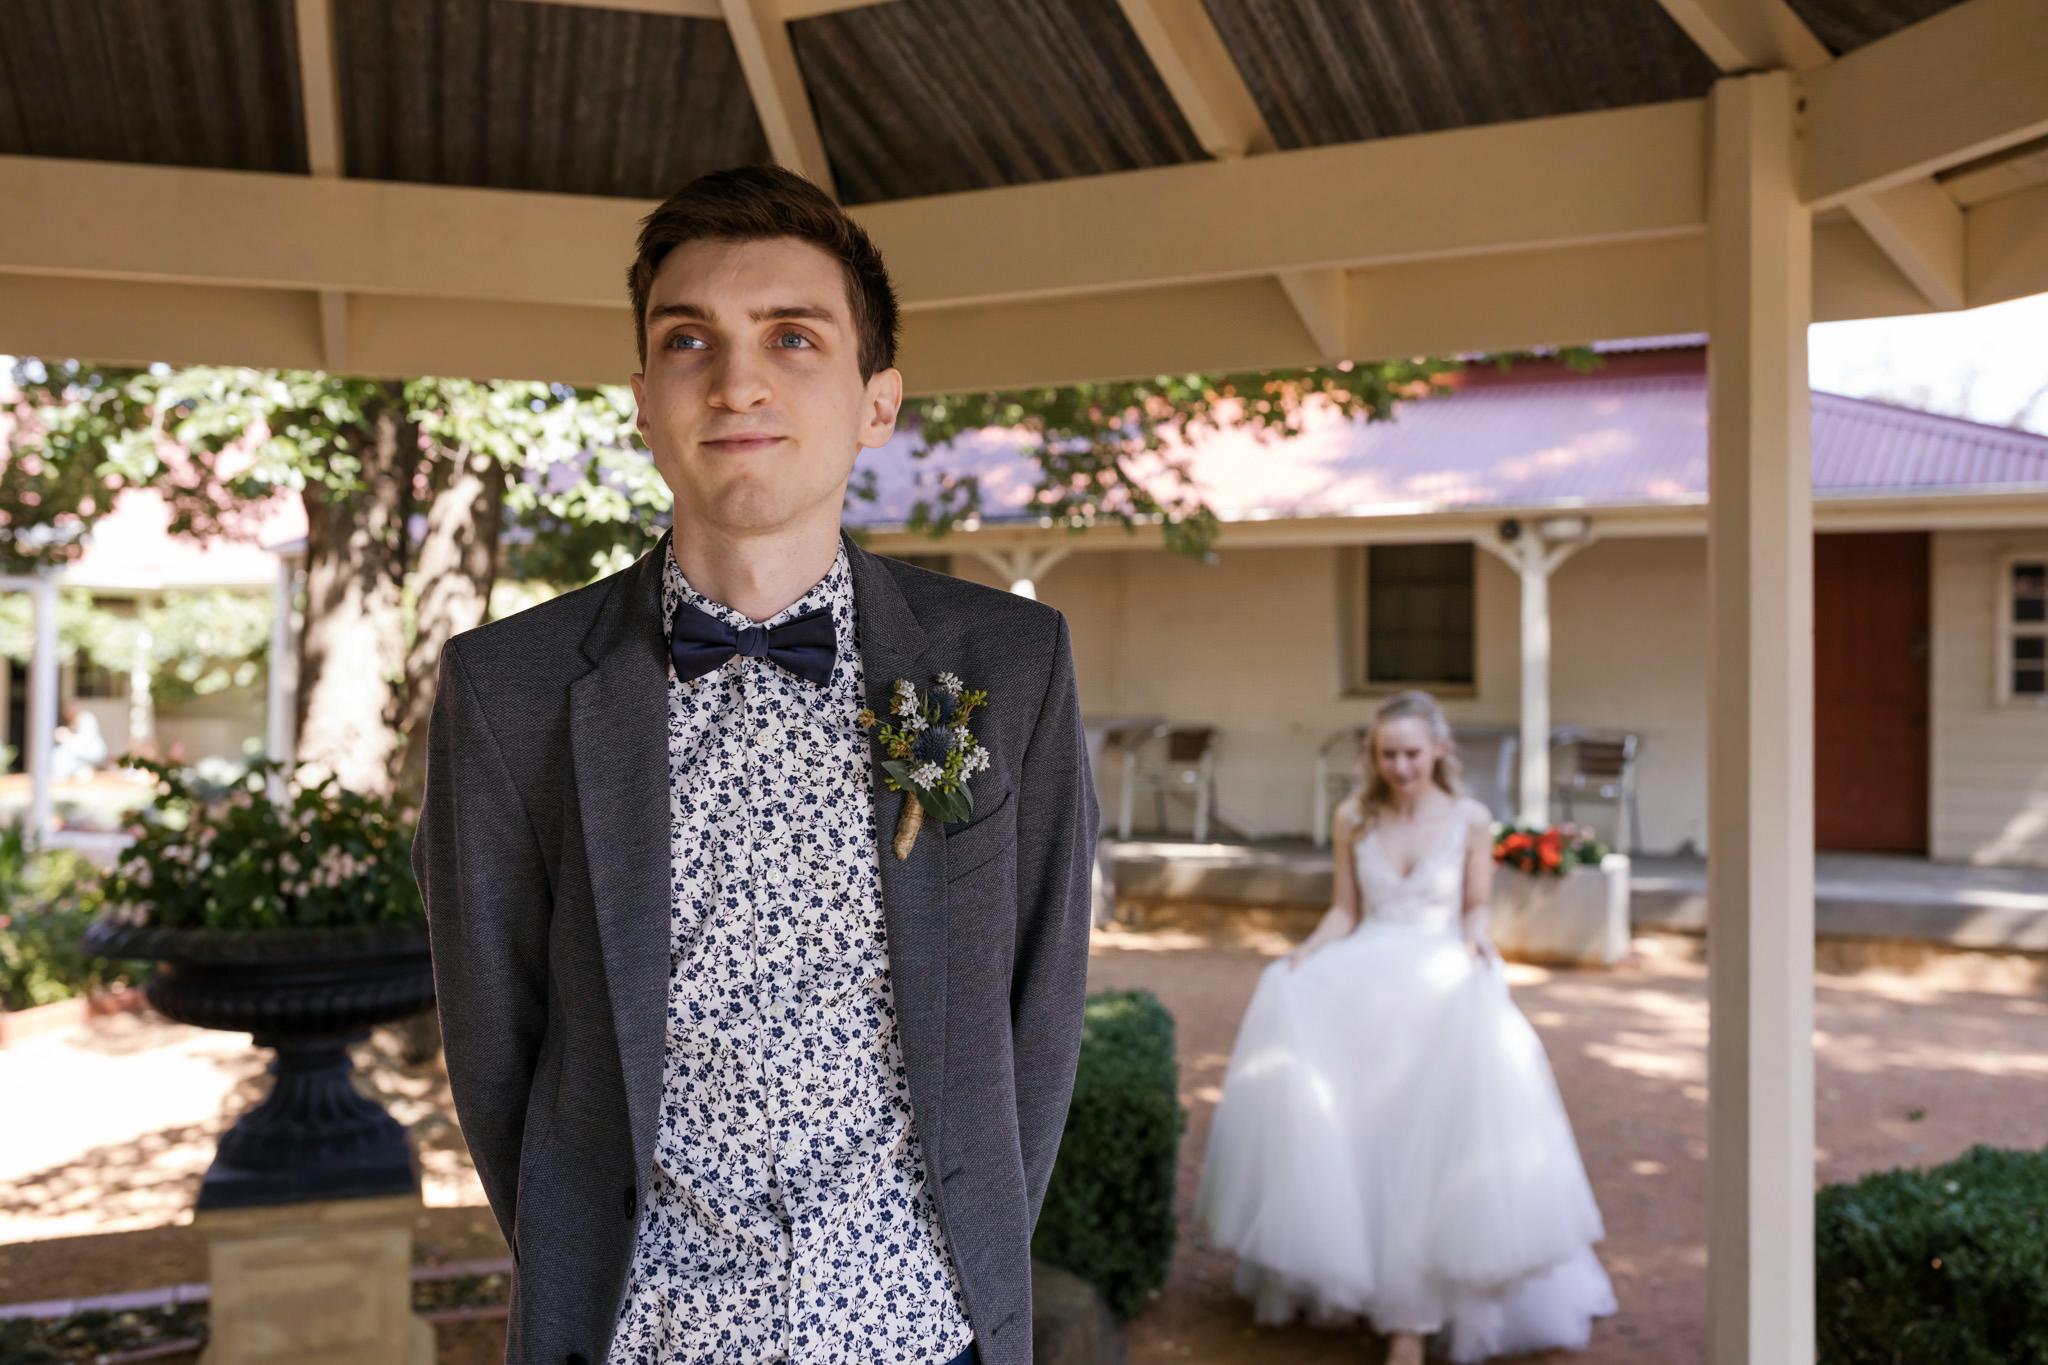 Erin_Latimore_Mudgee_Canberra_Wedding_Photographer_Tuggeranong_Homestead_051.JPG